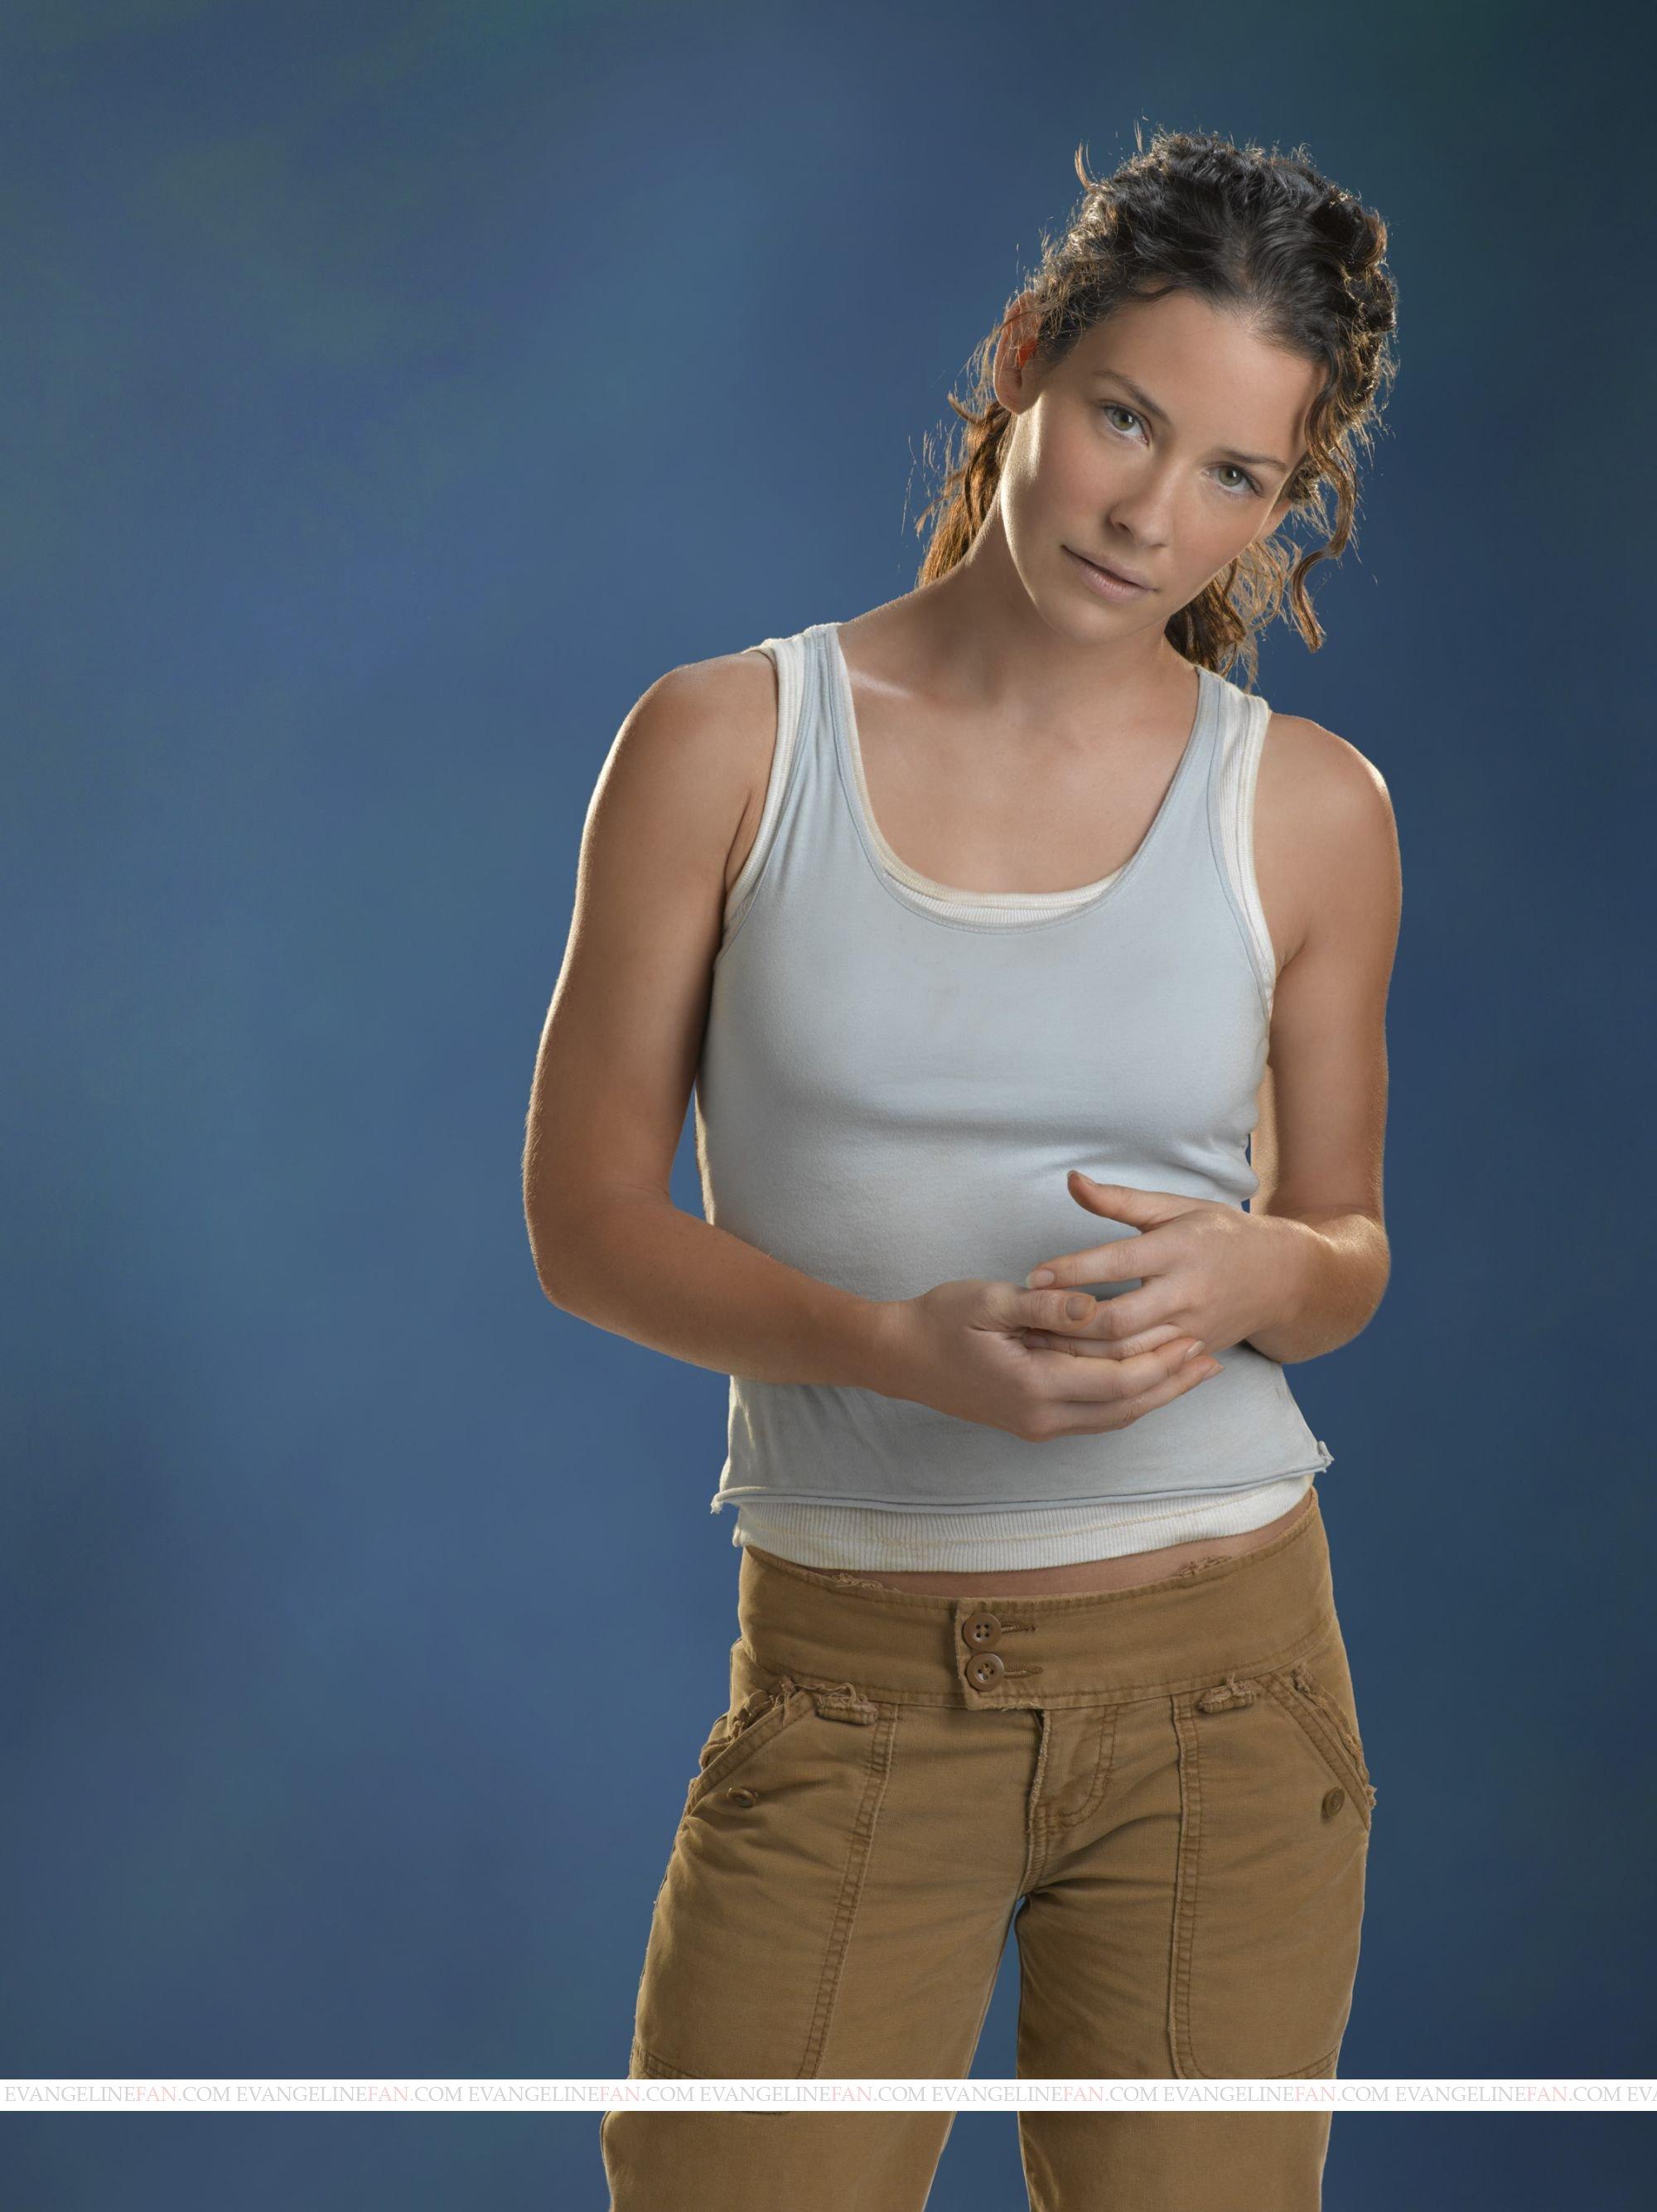 Evangeline Lilly (86 фото) » Картины, художники, фотографы